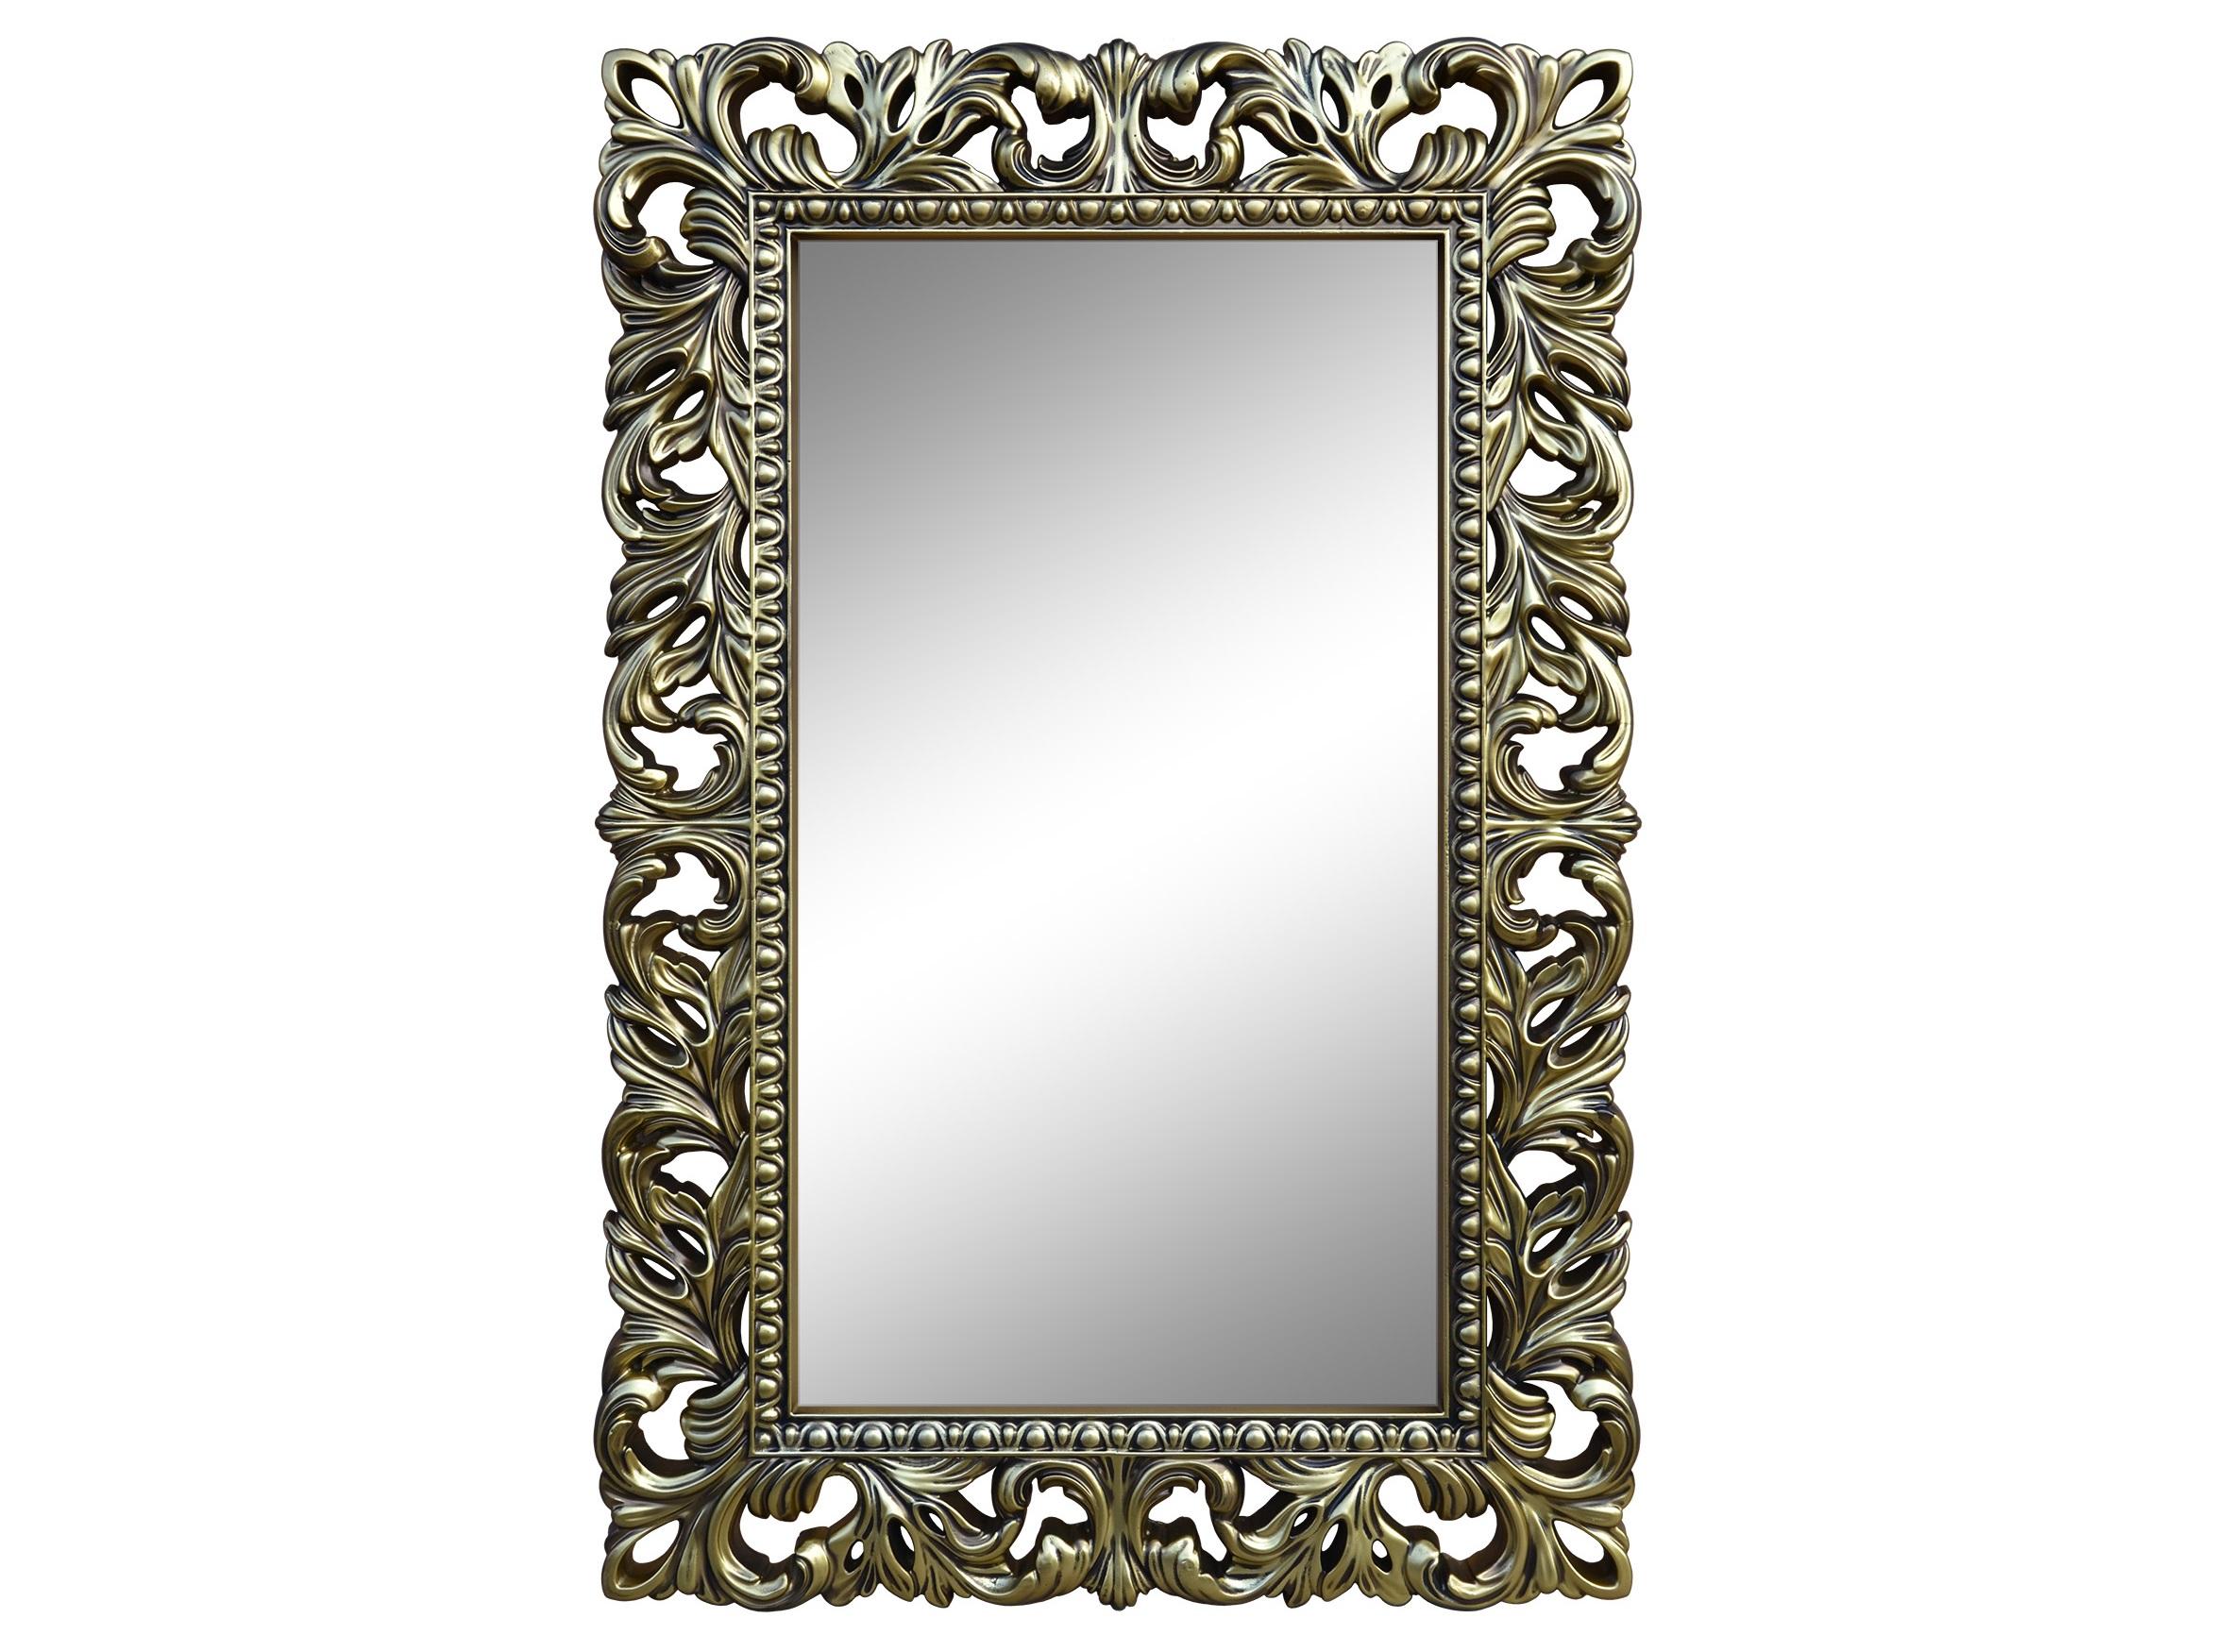 Зеркало Reeforma 15430870 от thefurnish